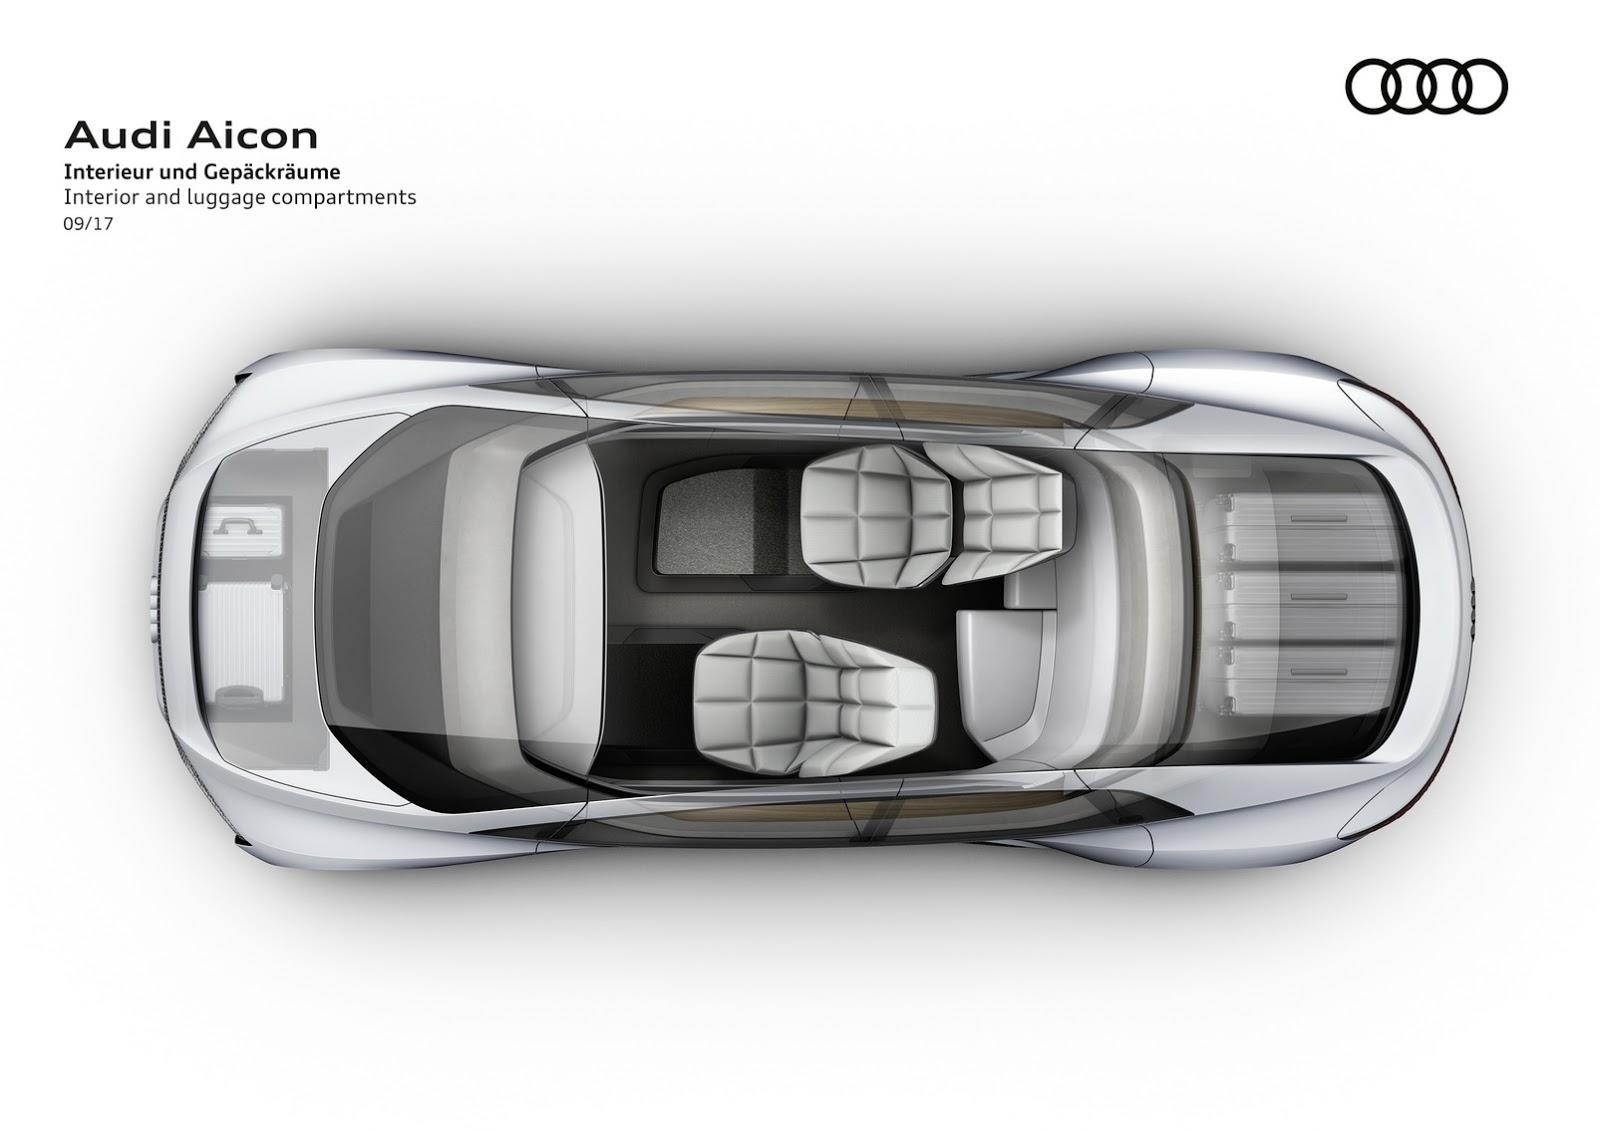 audi-aircon-frankfurt-concept-9